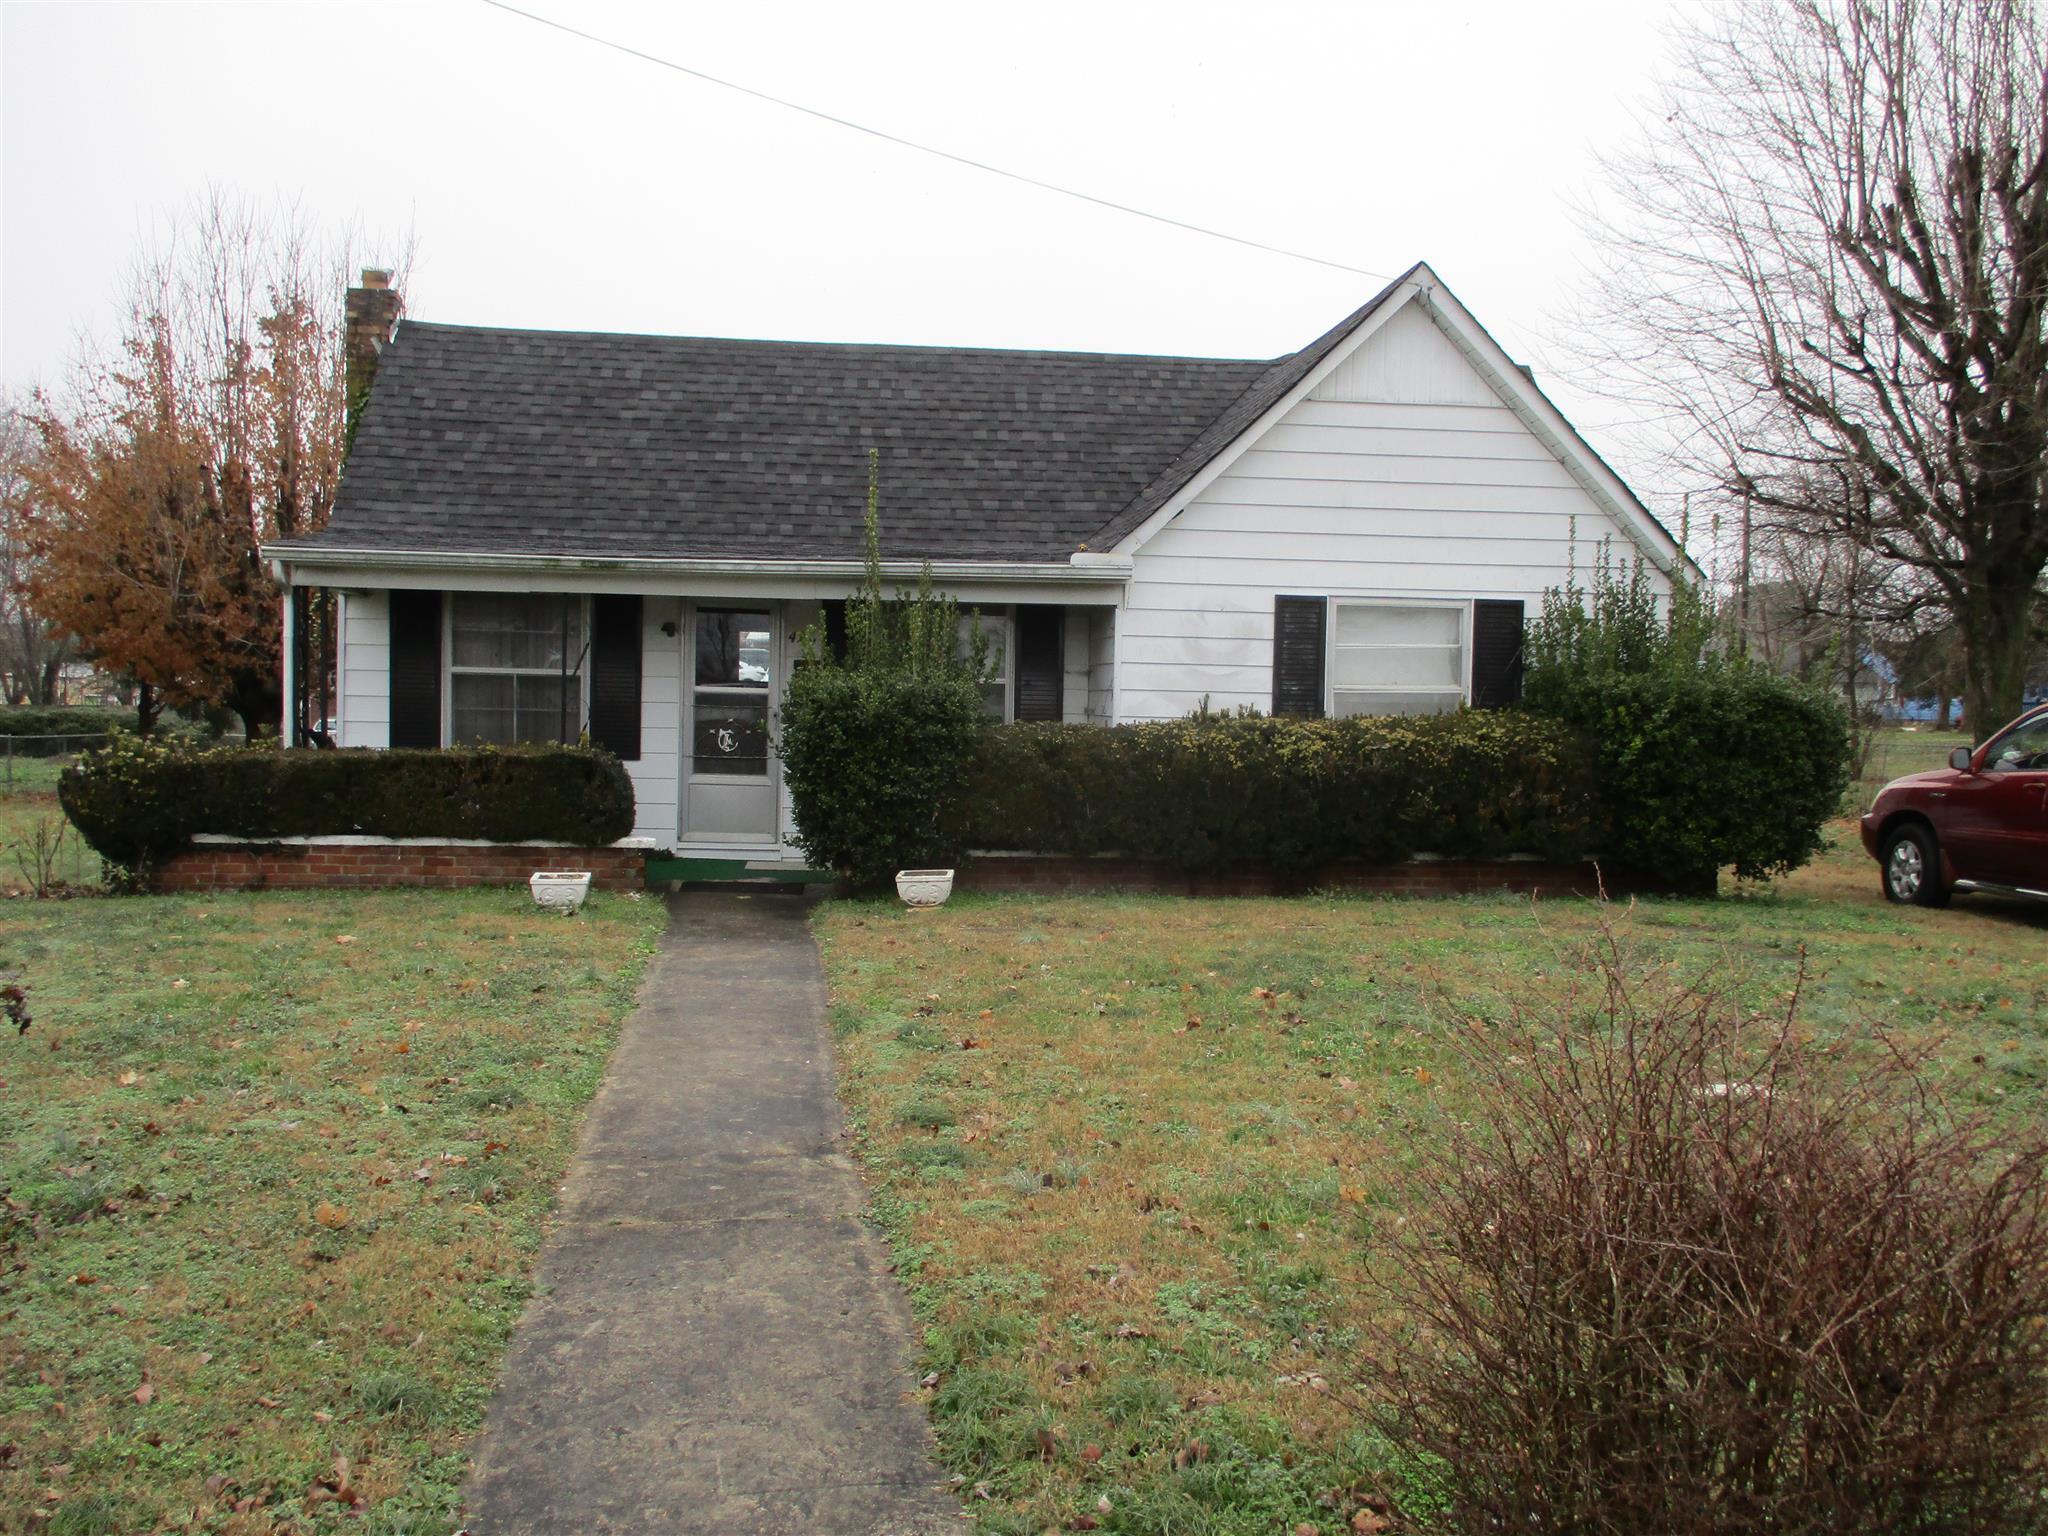 426 Frank St, Lawrenceburg, TN 38464 - Lawrenceburg, TN real estate listing